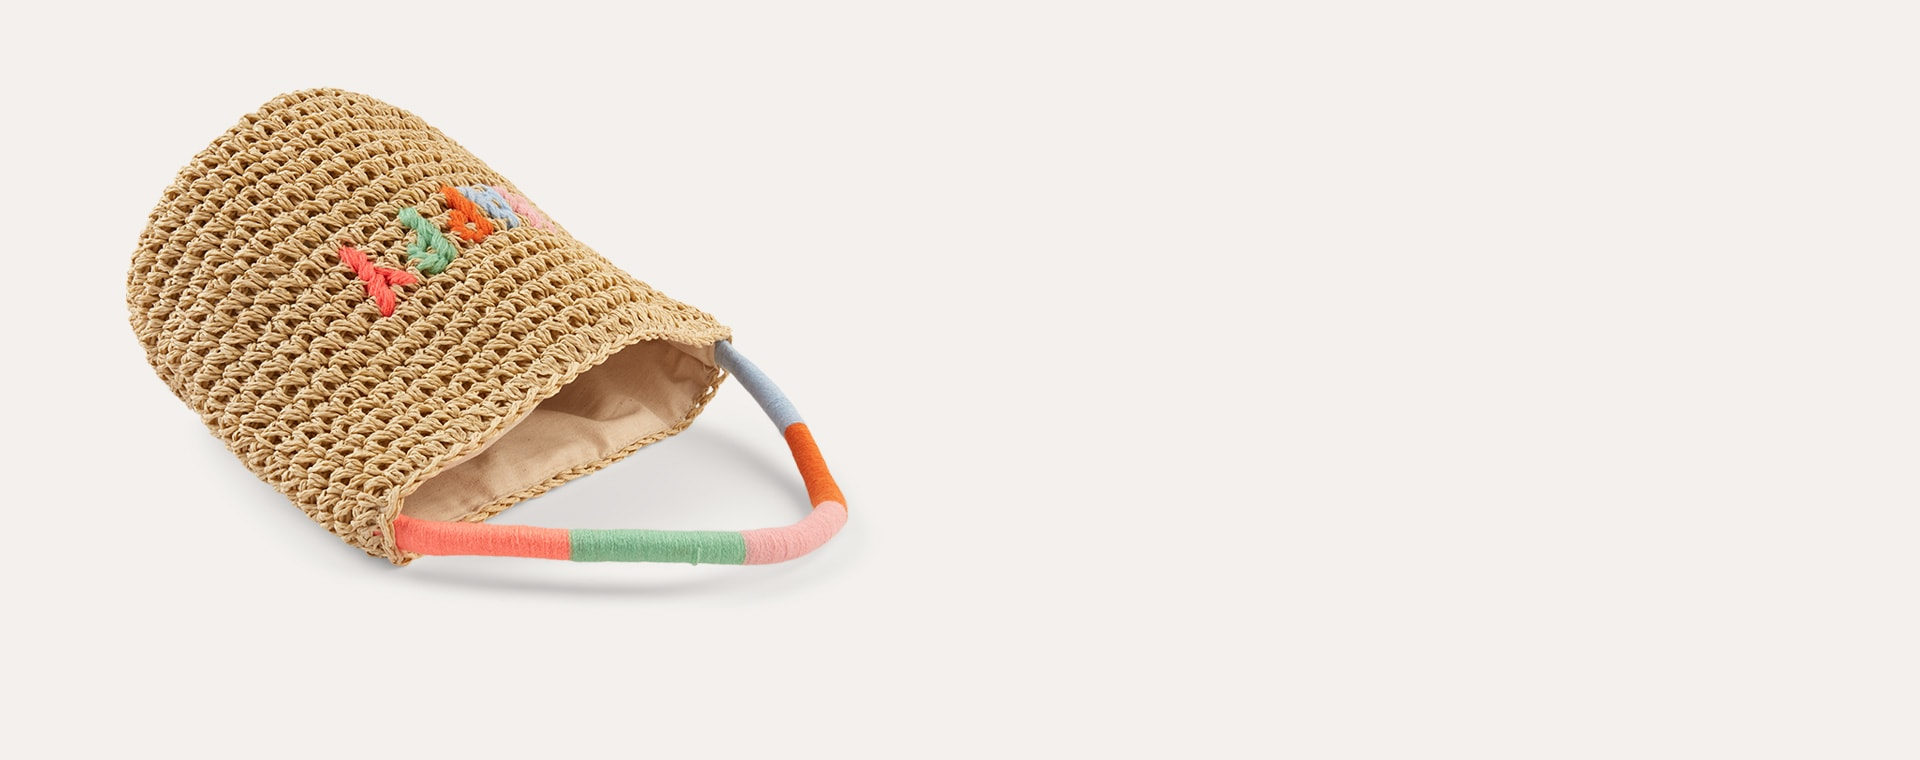 Neutral Meri Meri Happy Woven Straw Bag